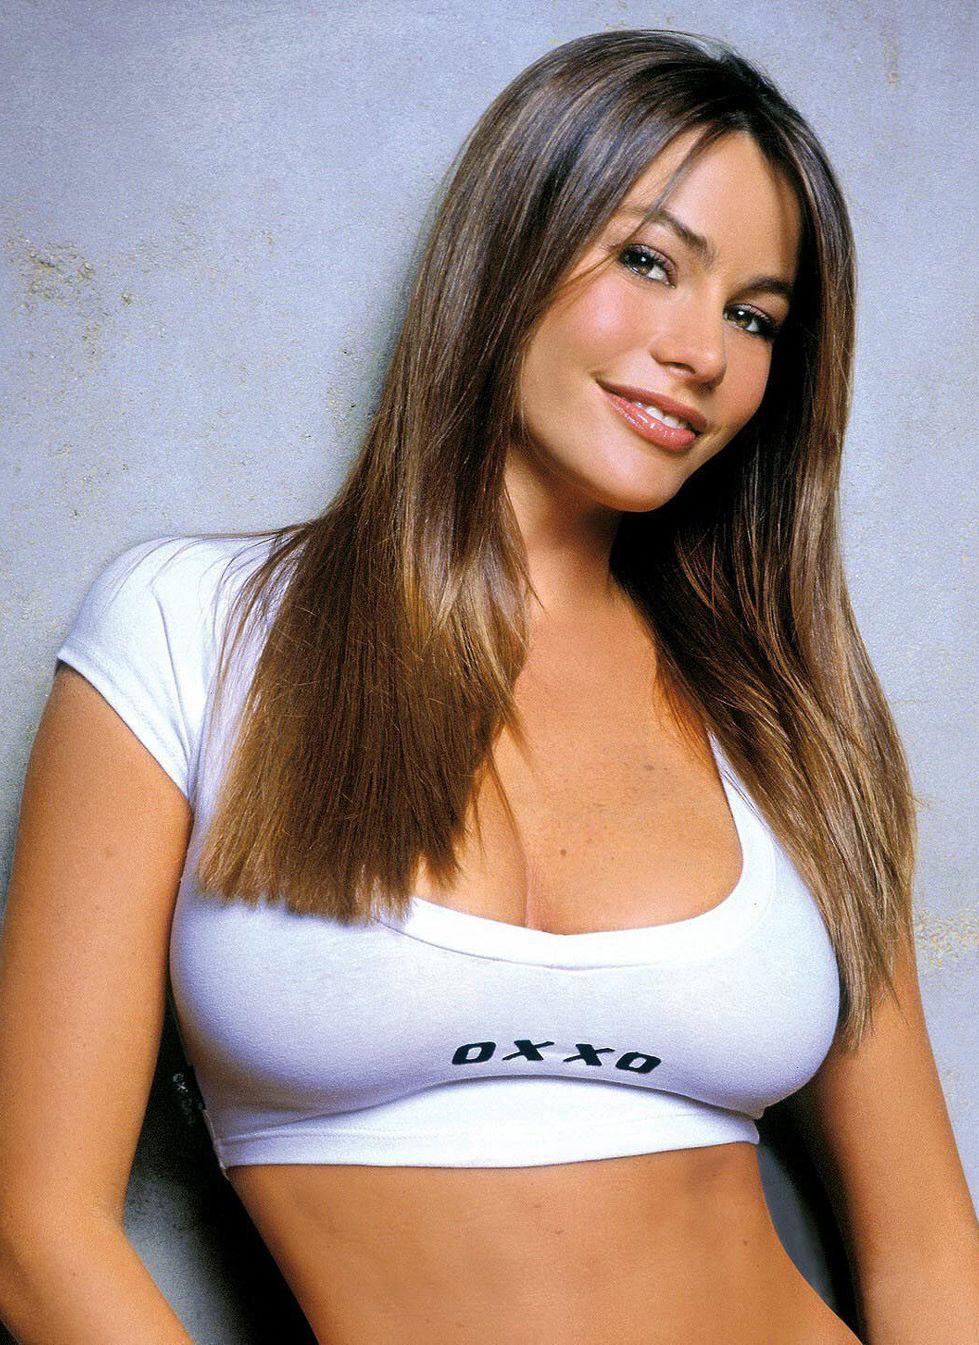 Sofia Vergara White Tshirt Looking Beautiful Mobile Wallpaper